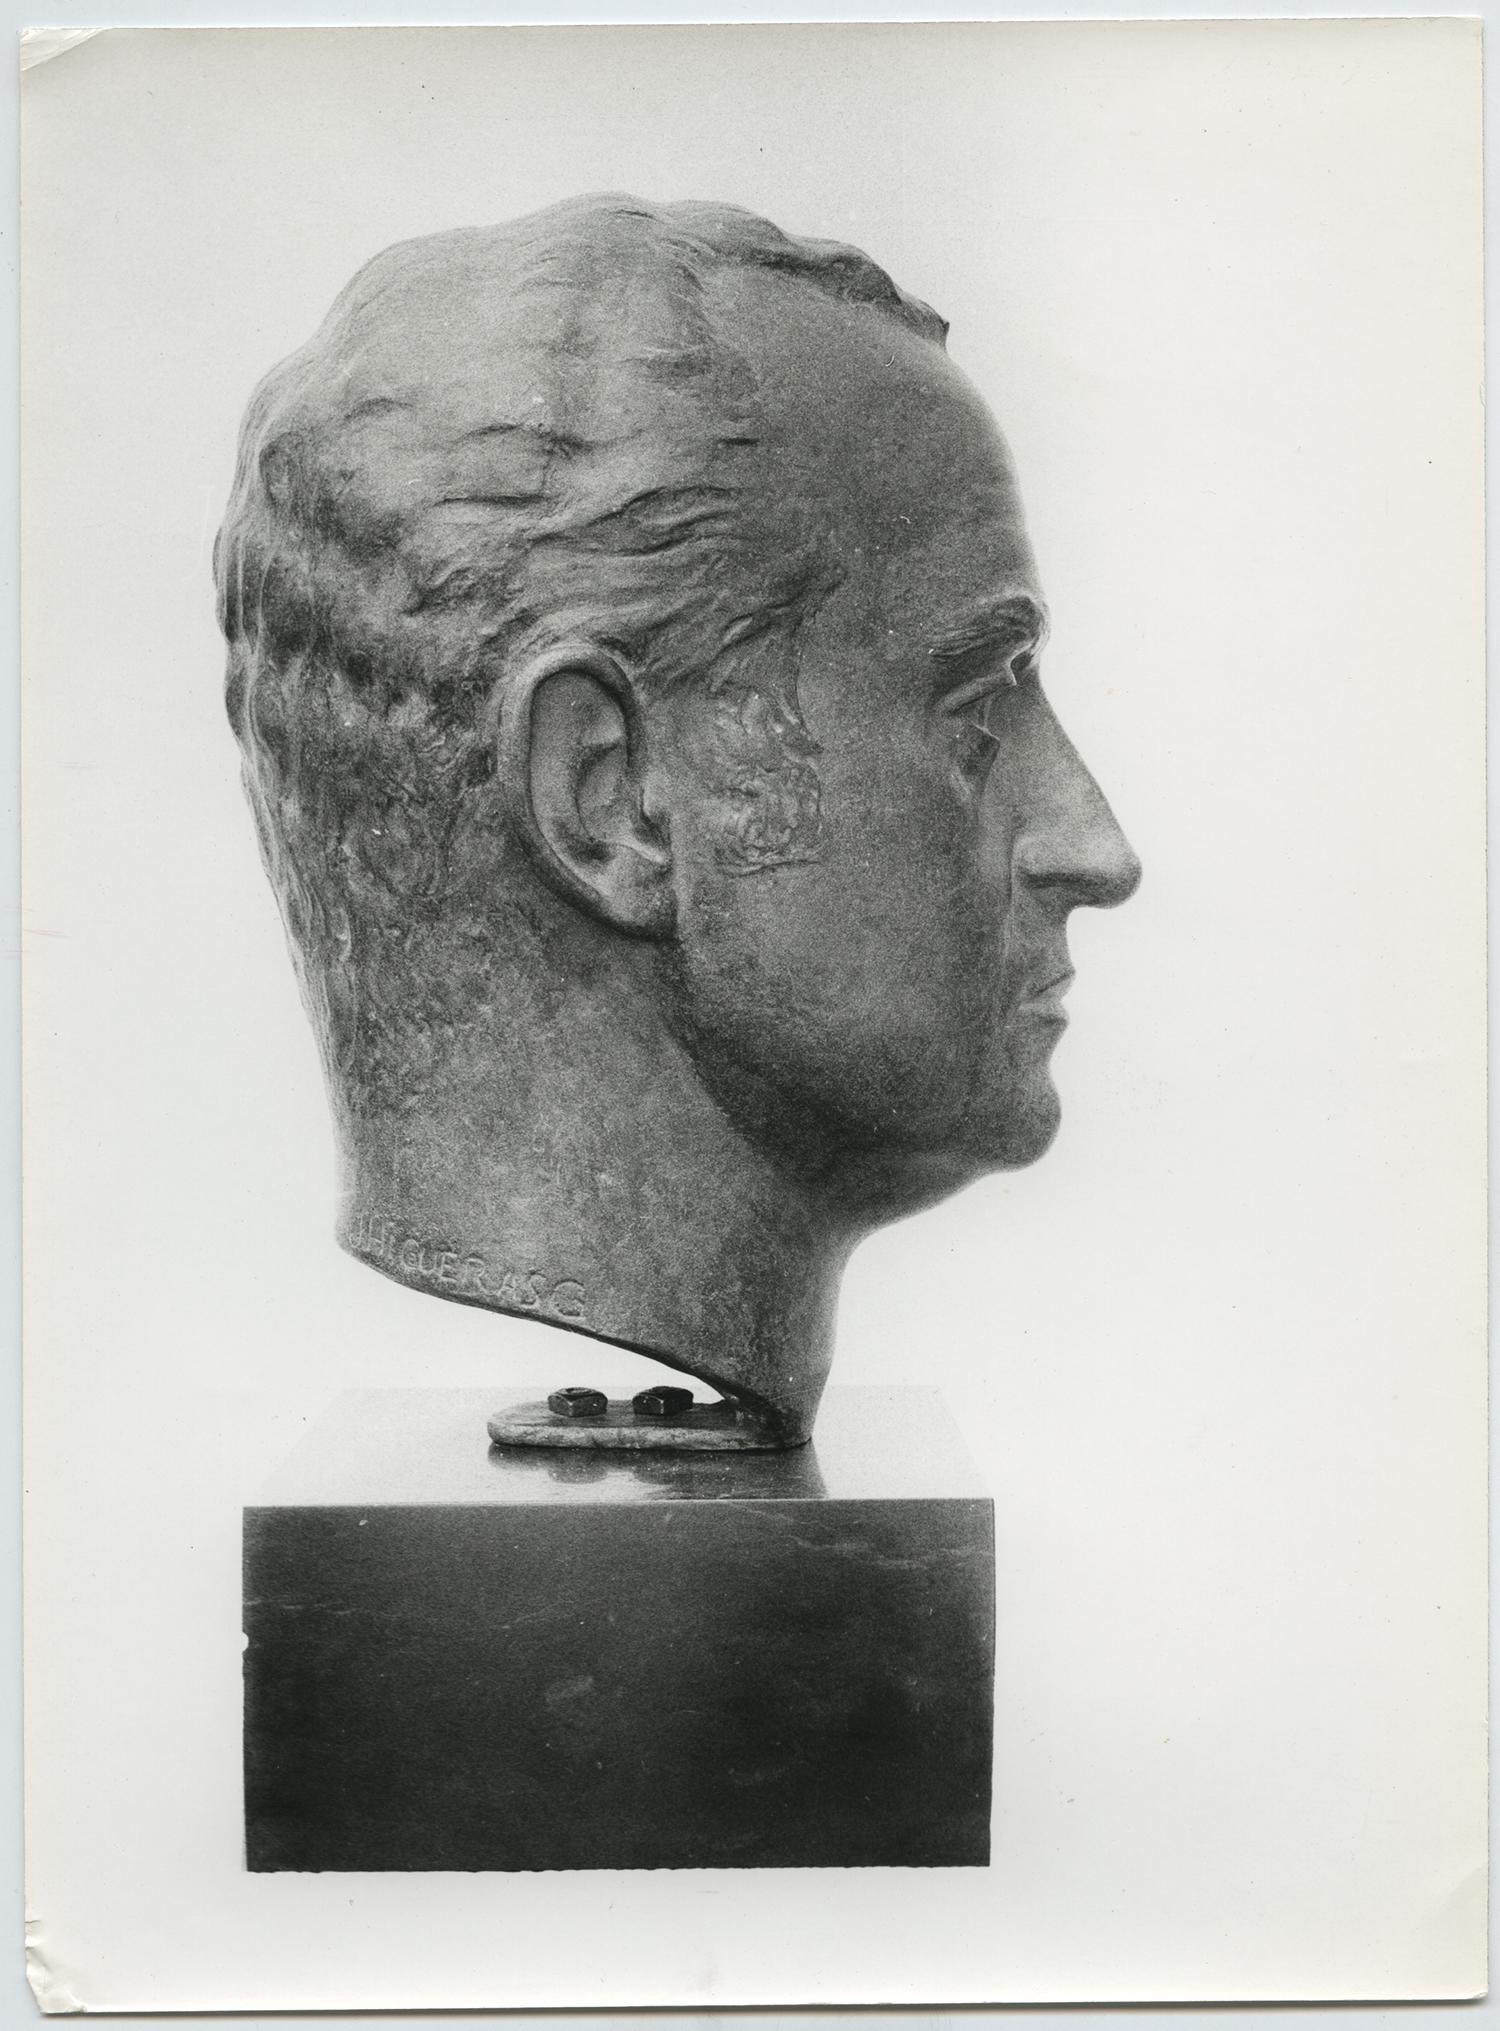 1977.1. Cabeza del Rey Juan Carlos I, bronce, 40x28x30 cms. 1) Escuela Superior de Canto de Madrid. 2) Ministerio de Agricultura, Escalera Monumental. 1977